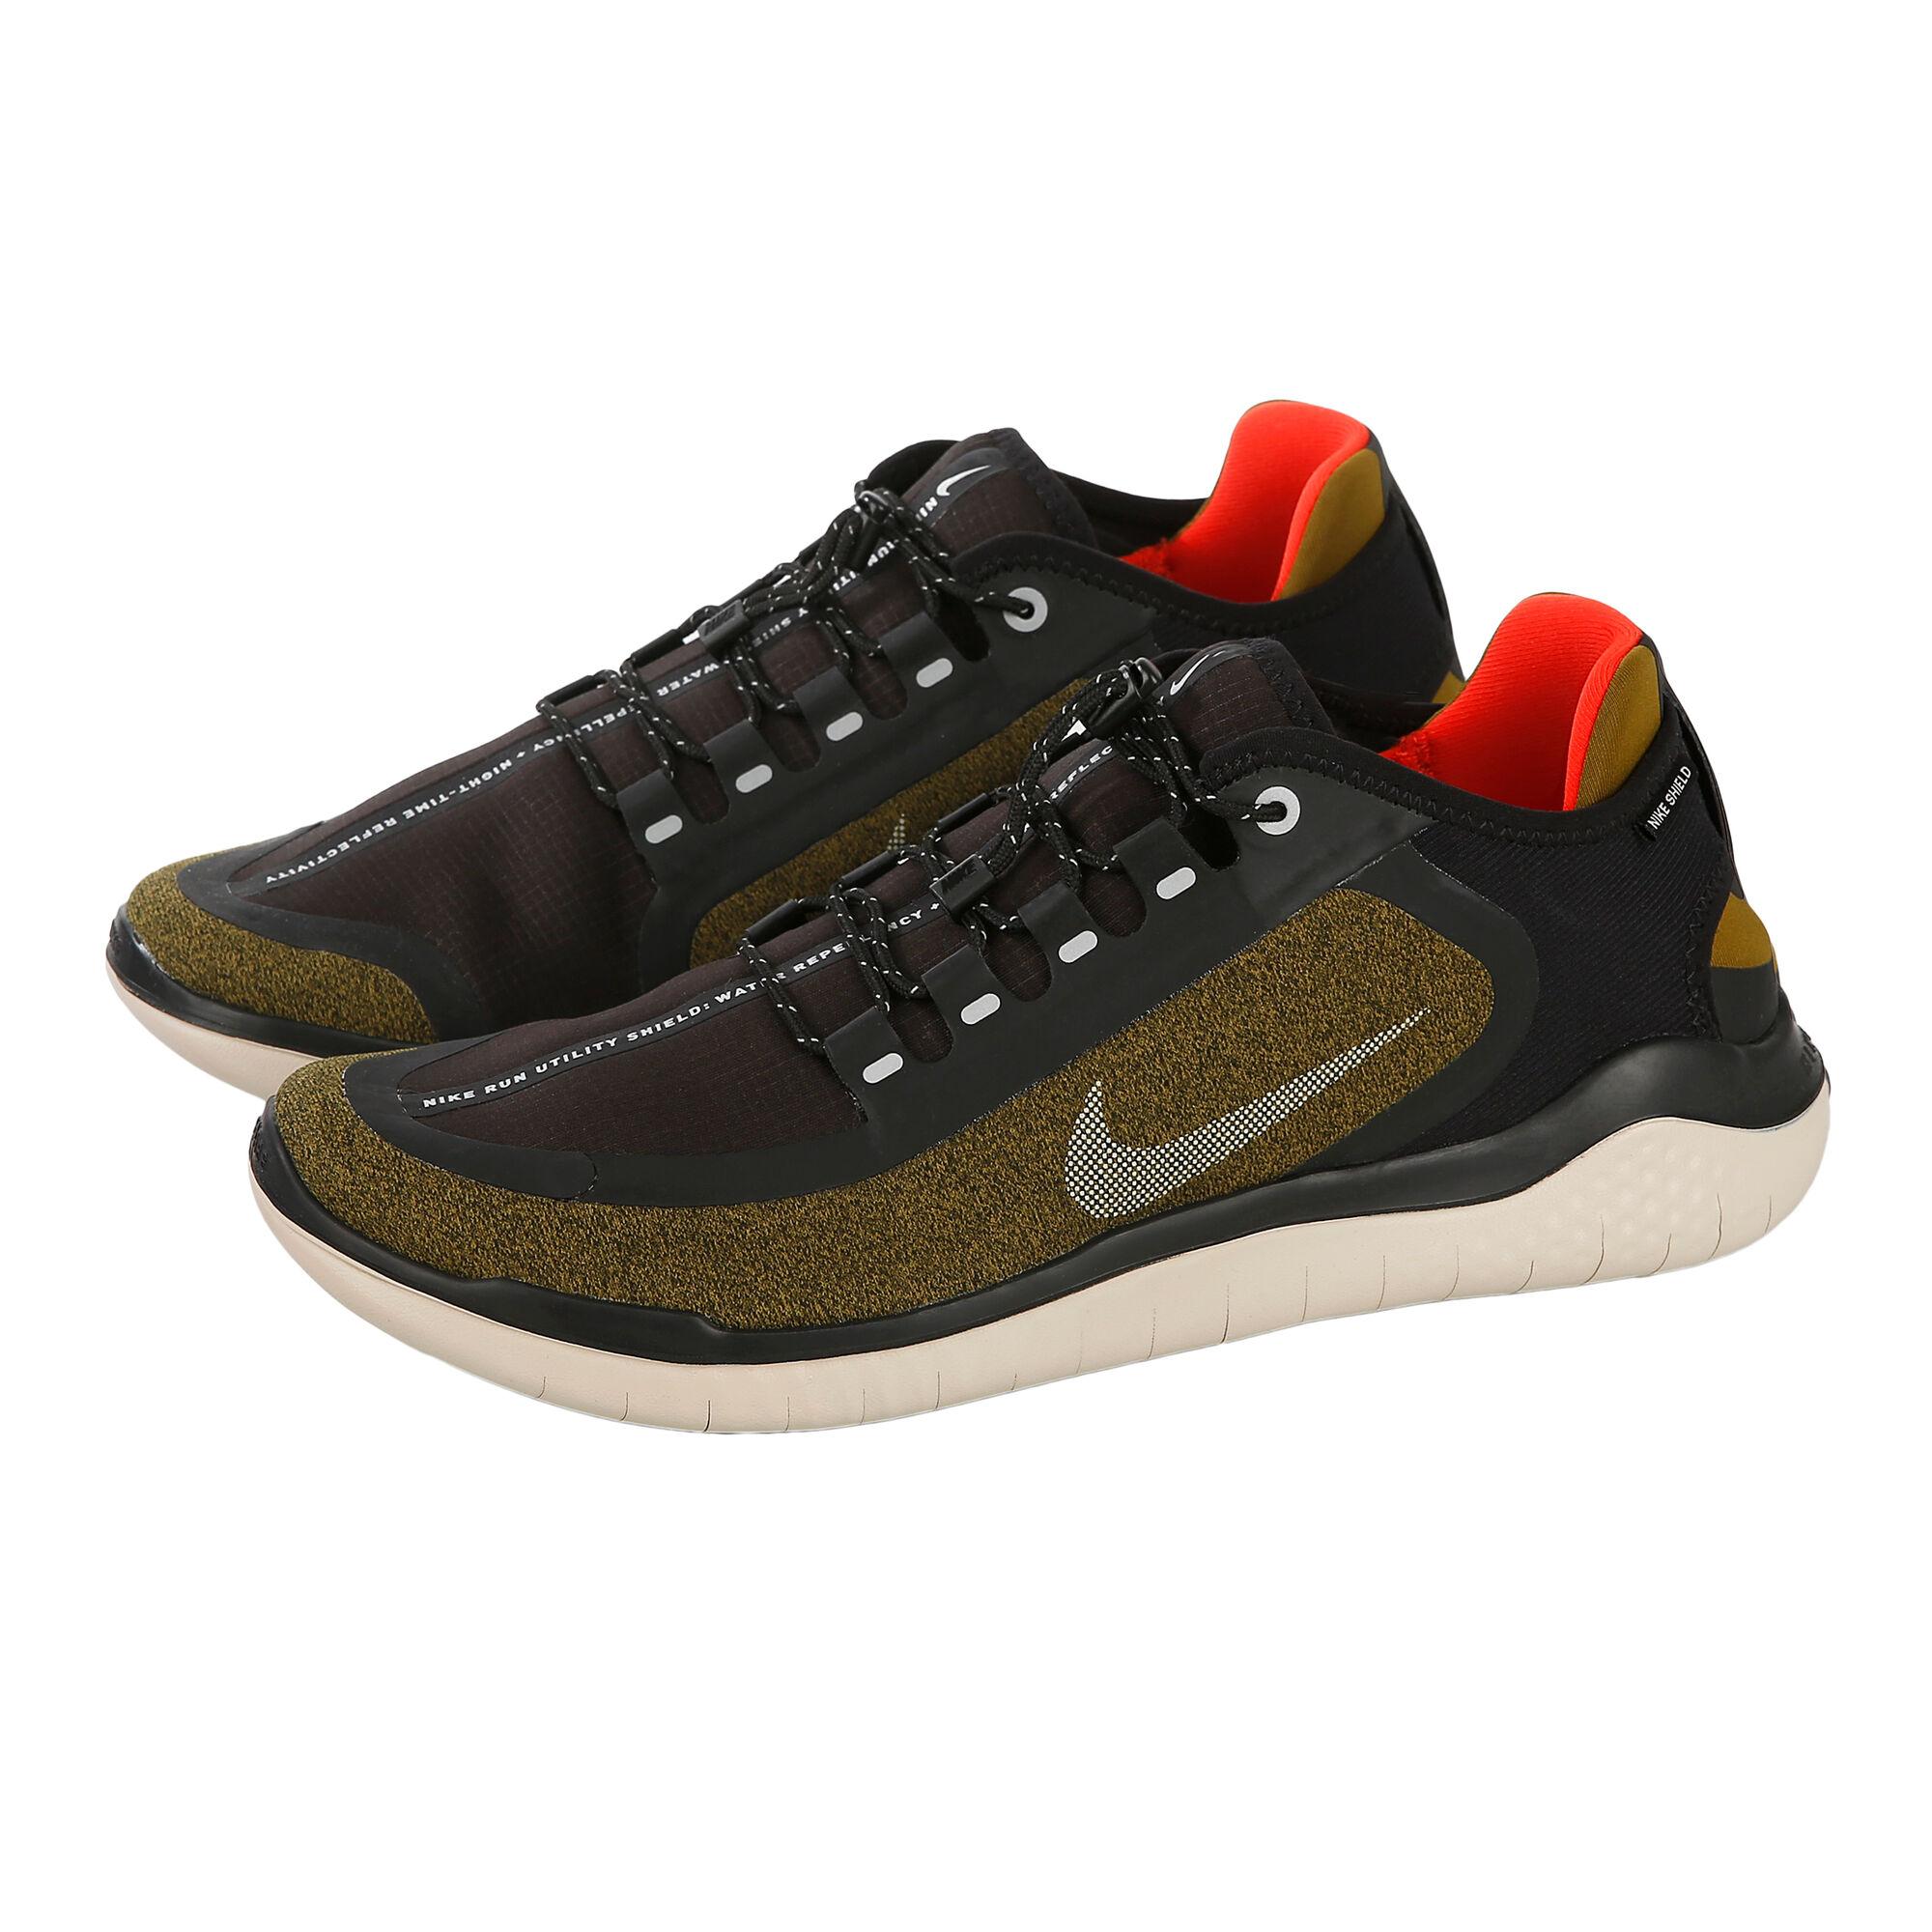 online store 07bd3 000ce ... Nike  Nike  Nike  Nike  Nike  Nike. Free Run 2018 Shield Men ...